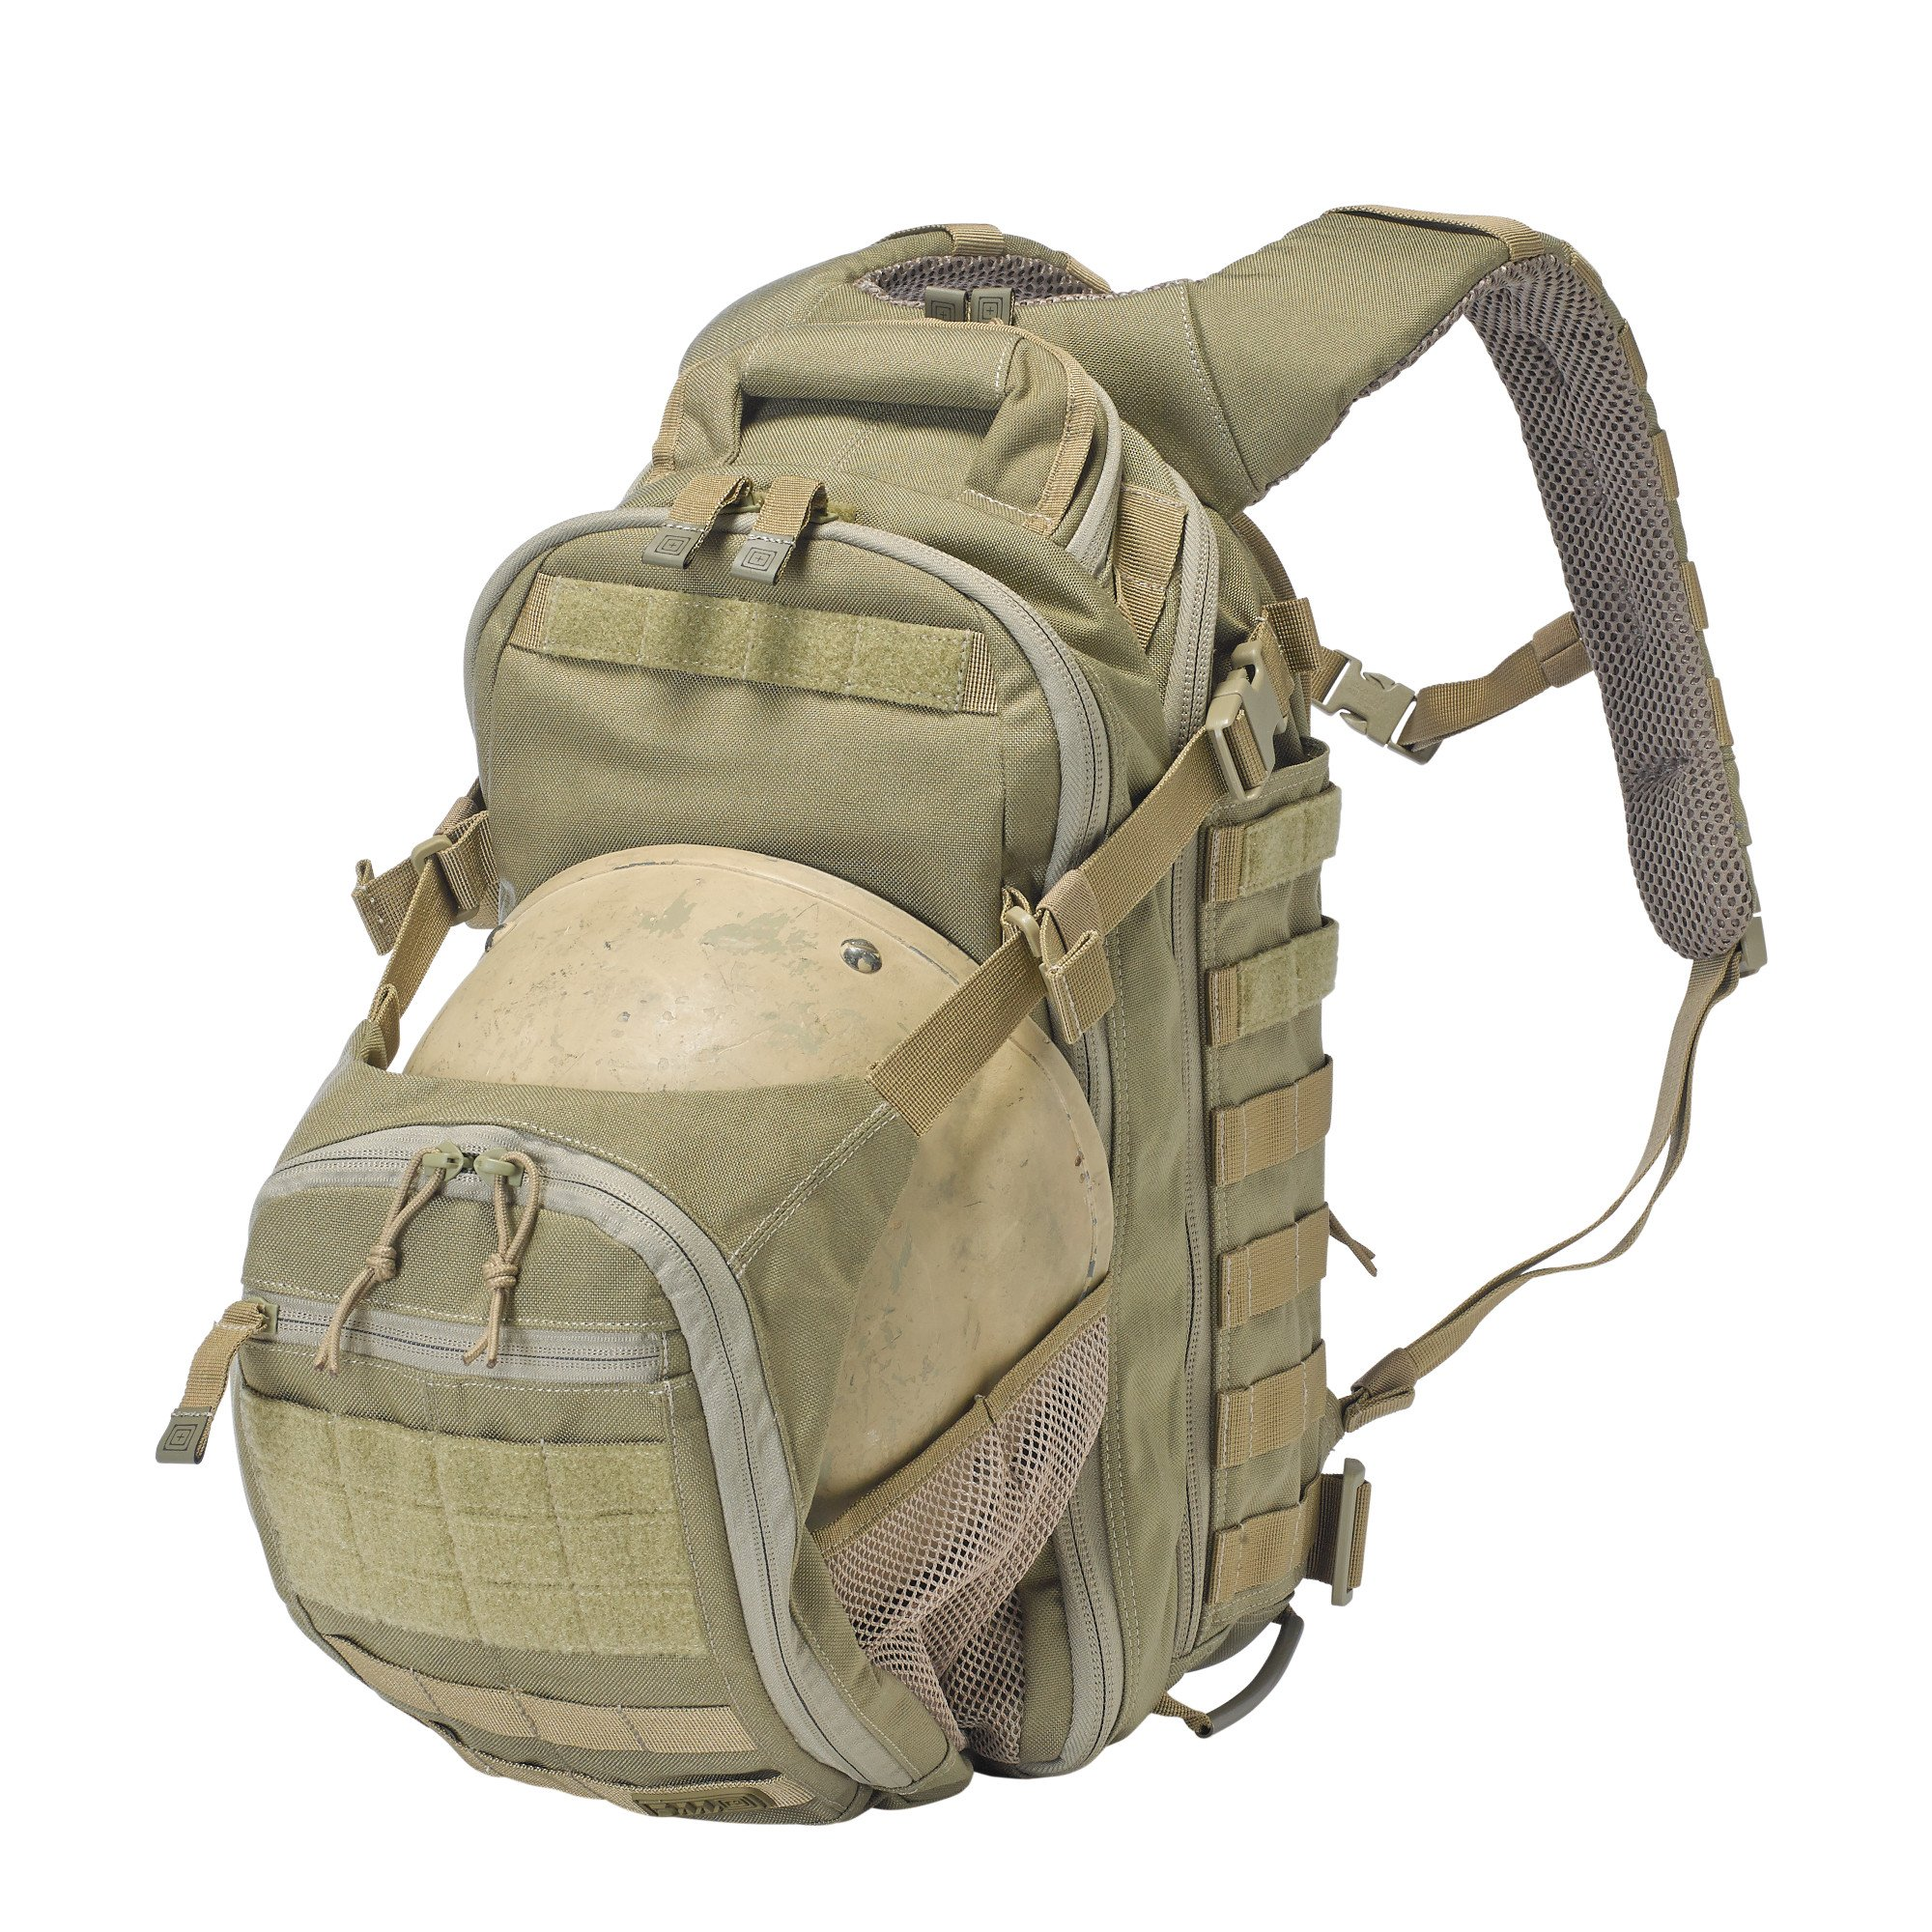 Balo 5.11 Tactical ALL HAZARDS NITRO 21L – Sanstone